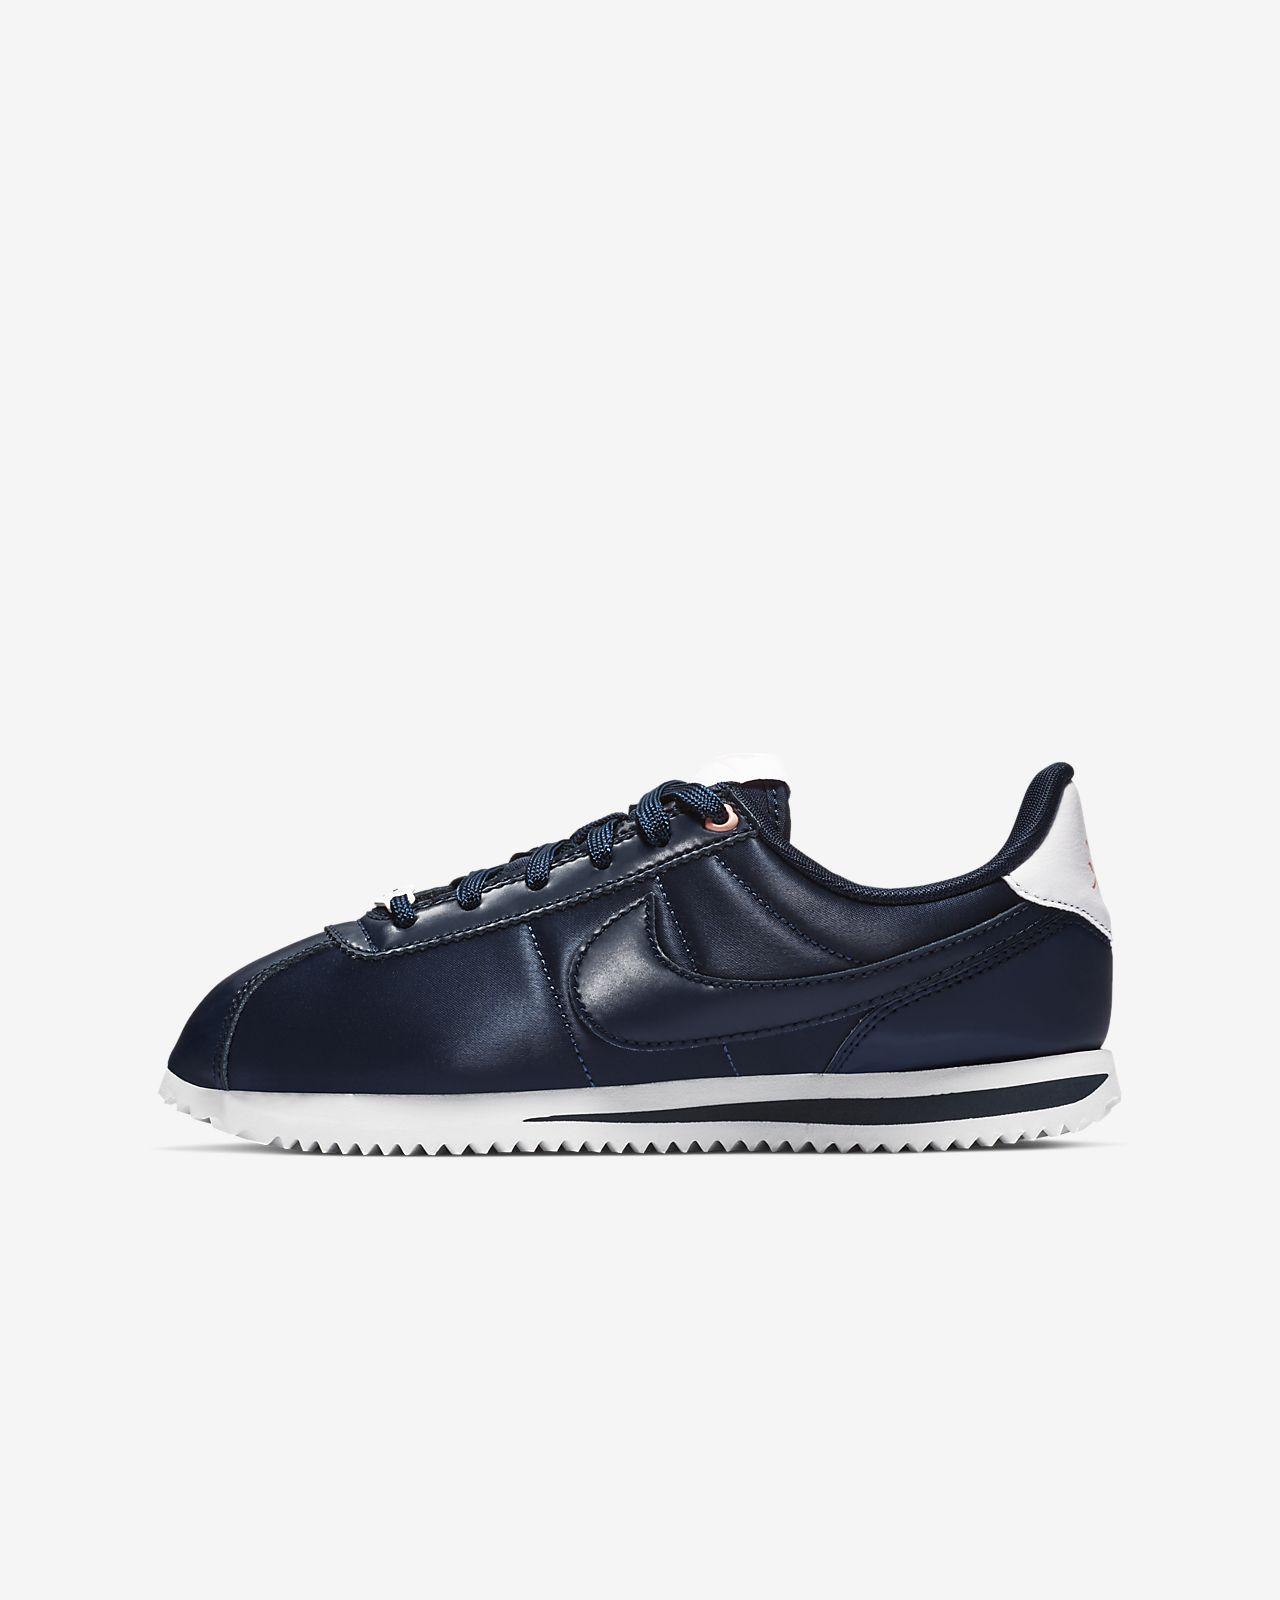 Nike Cortez Basic TXT VDAY (GS)大童运动童鞋